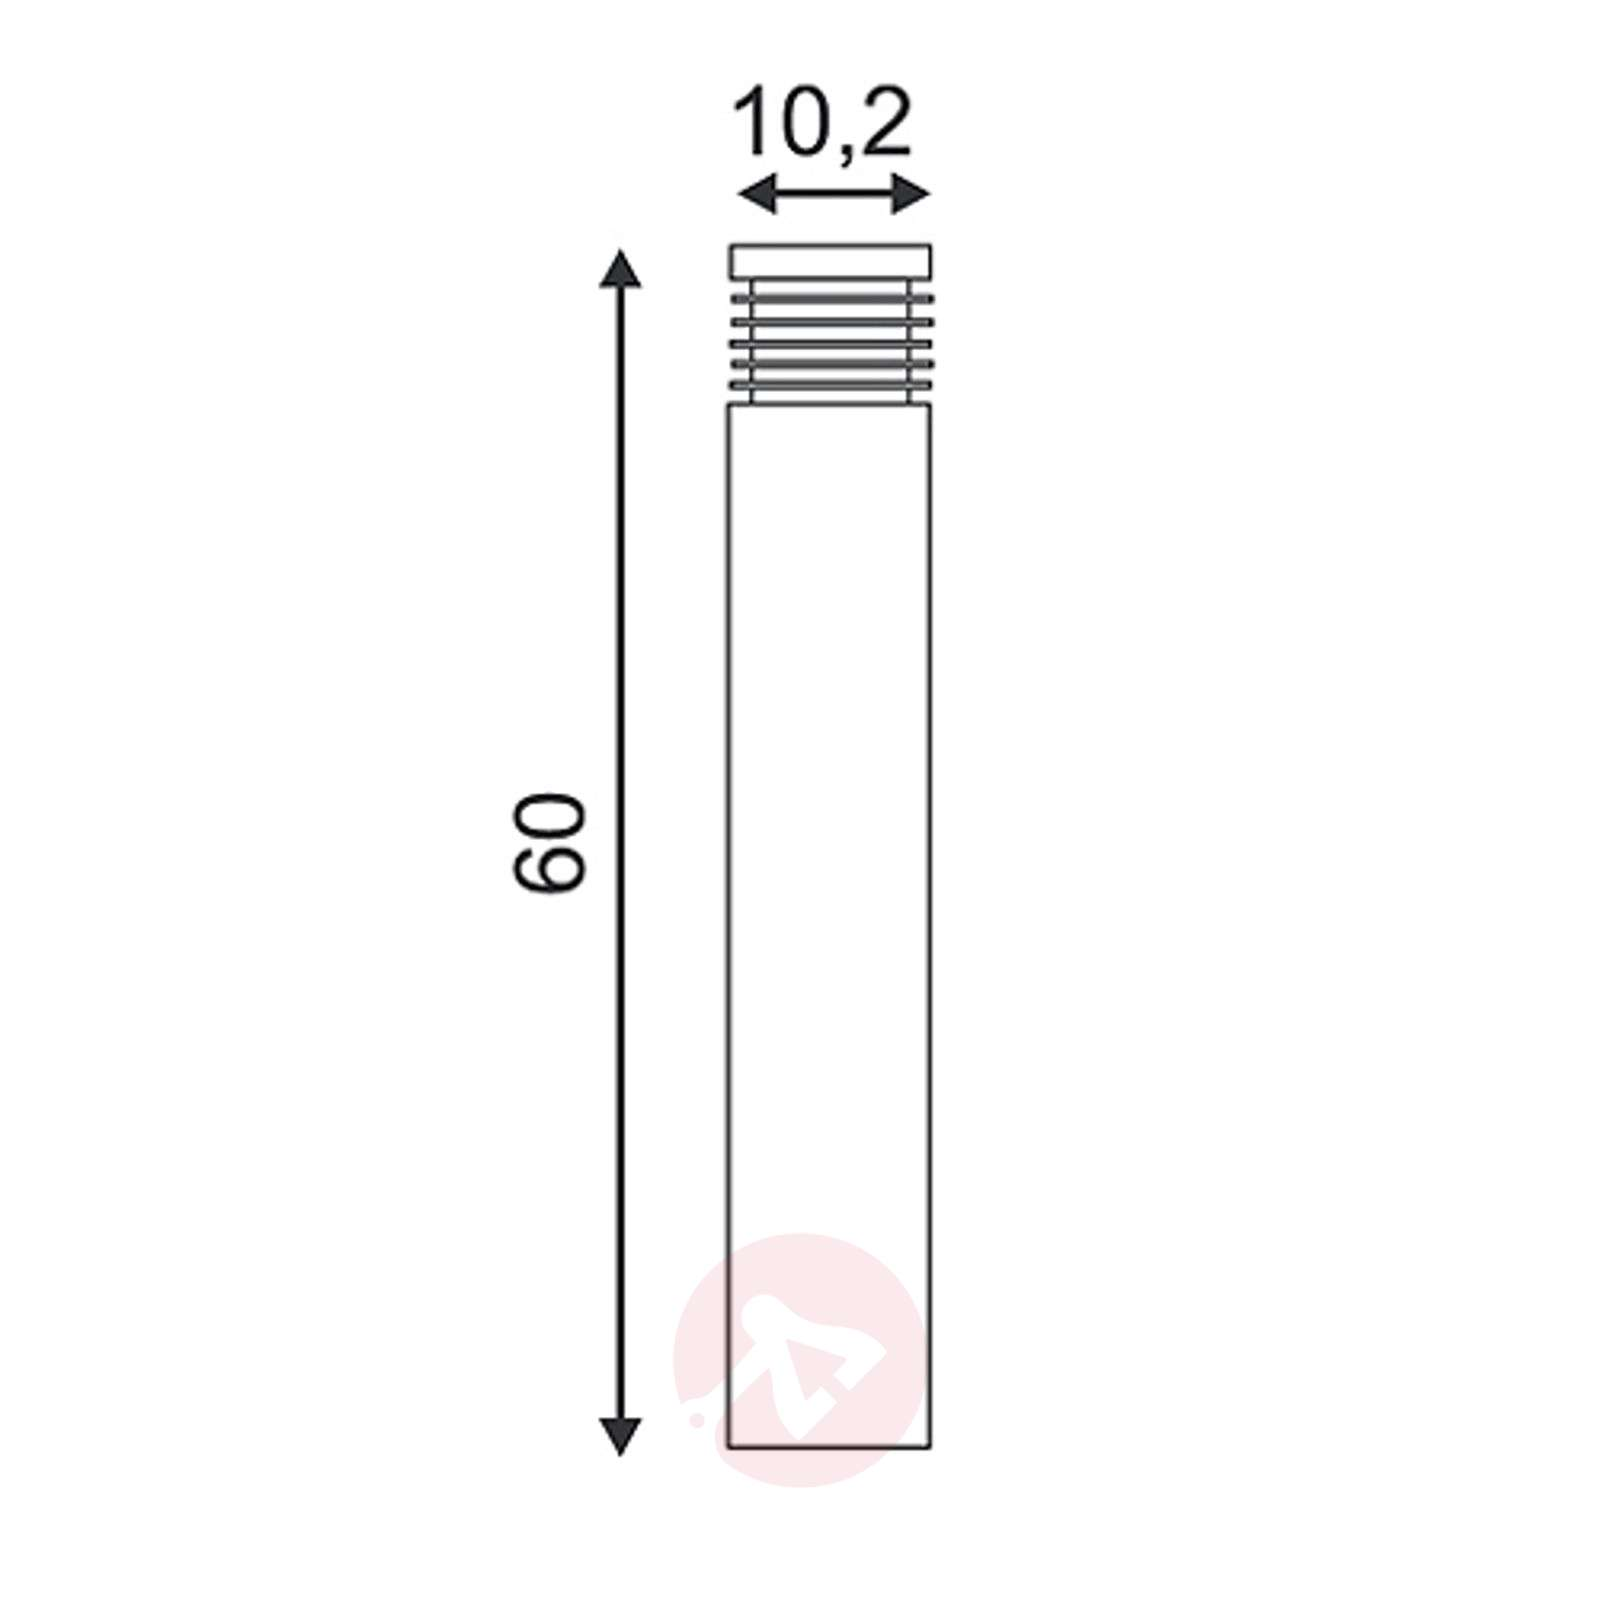 Moderni Vap Slim 60-pylväsvalaisin-5504194-01